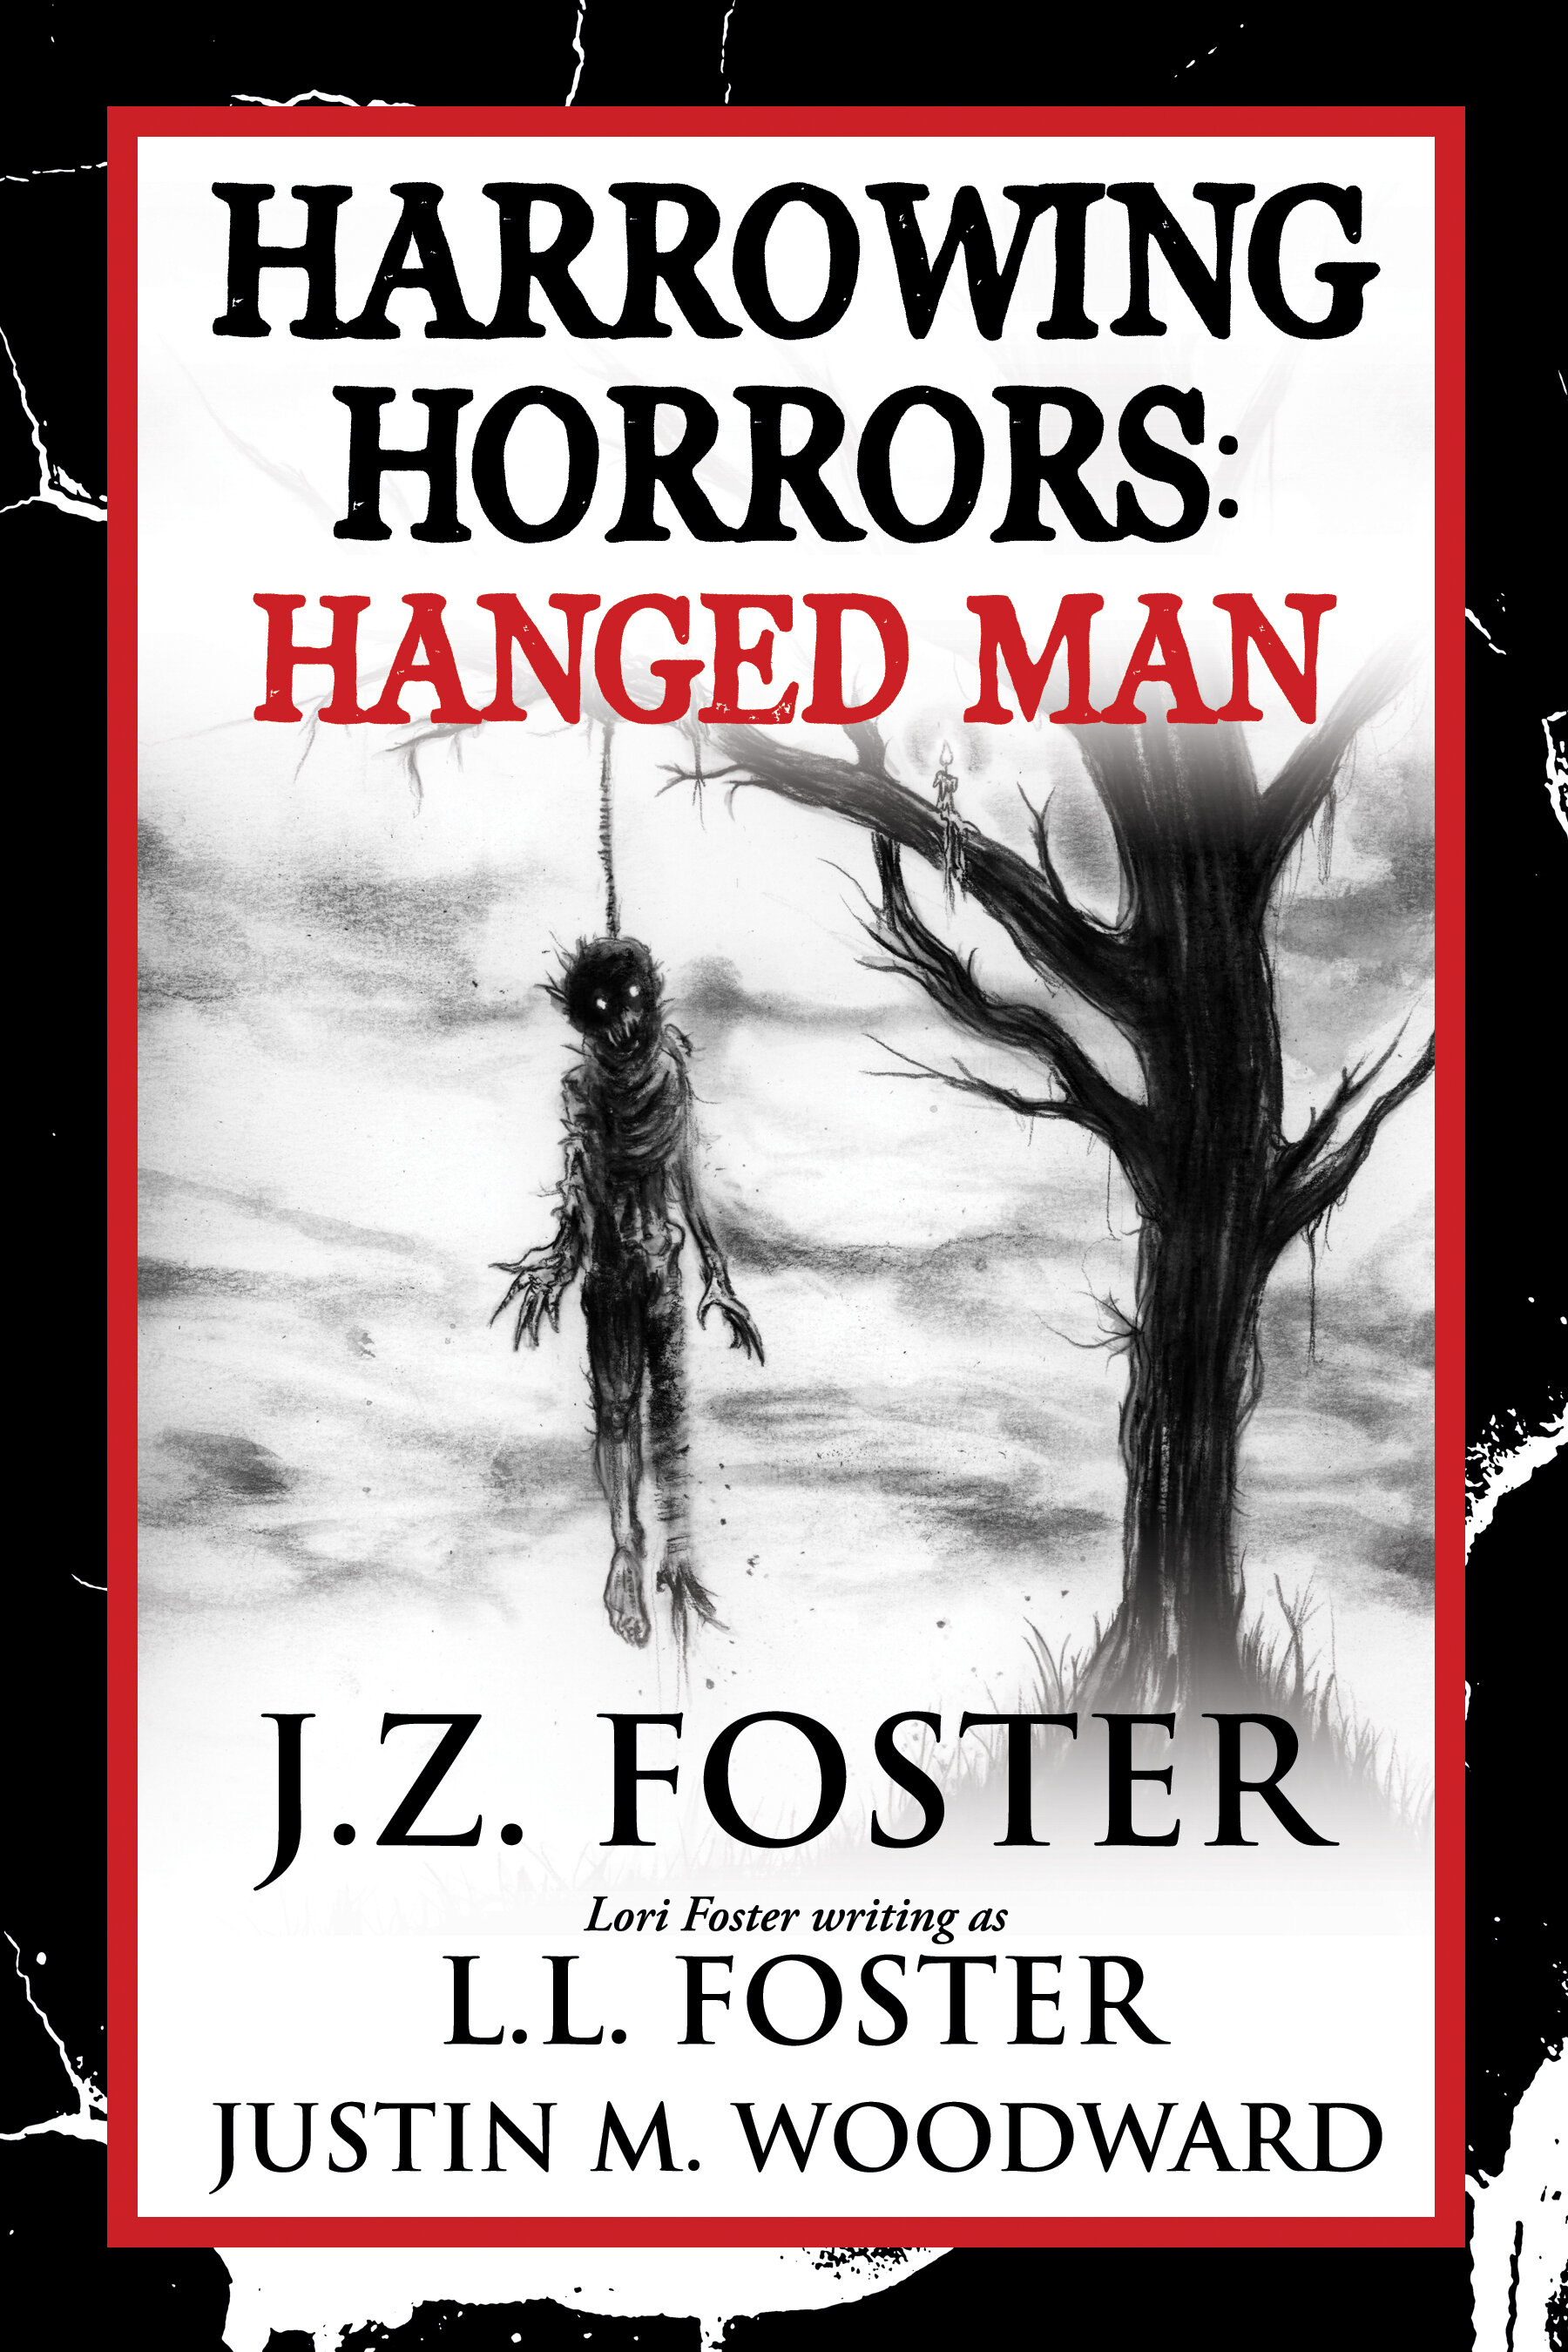 Harrowing Horrors - Hanged Man